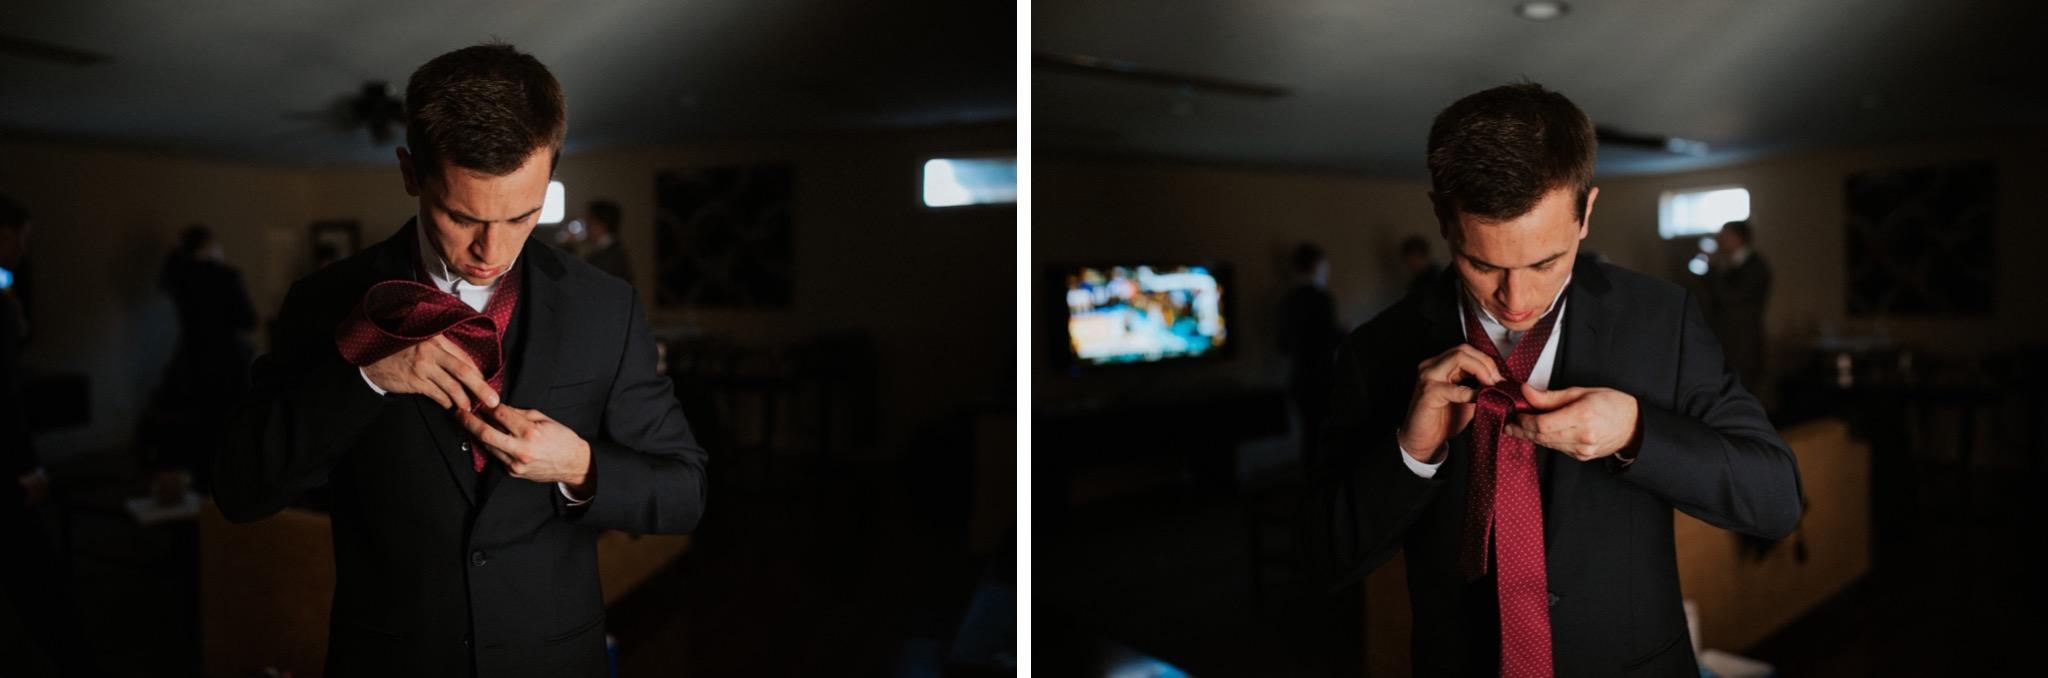 20_West Manor Estate Weddings - Pat Cori Photography-41_West Manor Estate Weddings - Pat Cori Photography-40_Portraits_PatCoriPhotography_groom_VirginiaWeddingPhotographer_WestManorEstate_gettingready.jpg